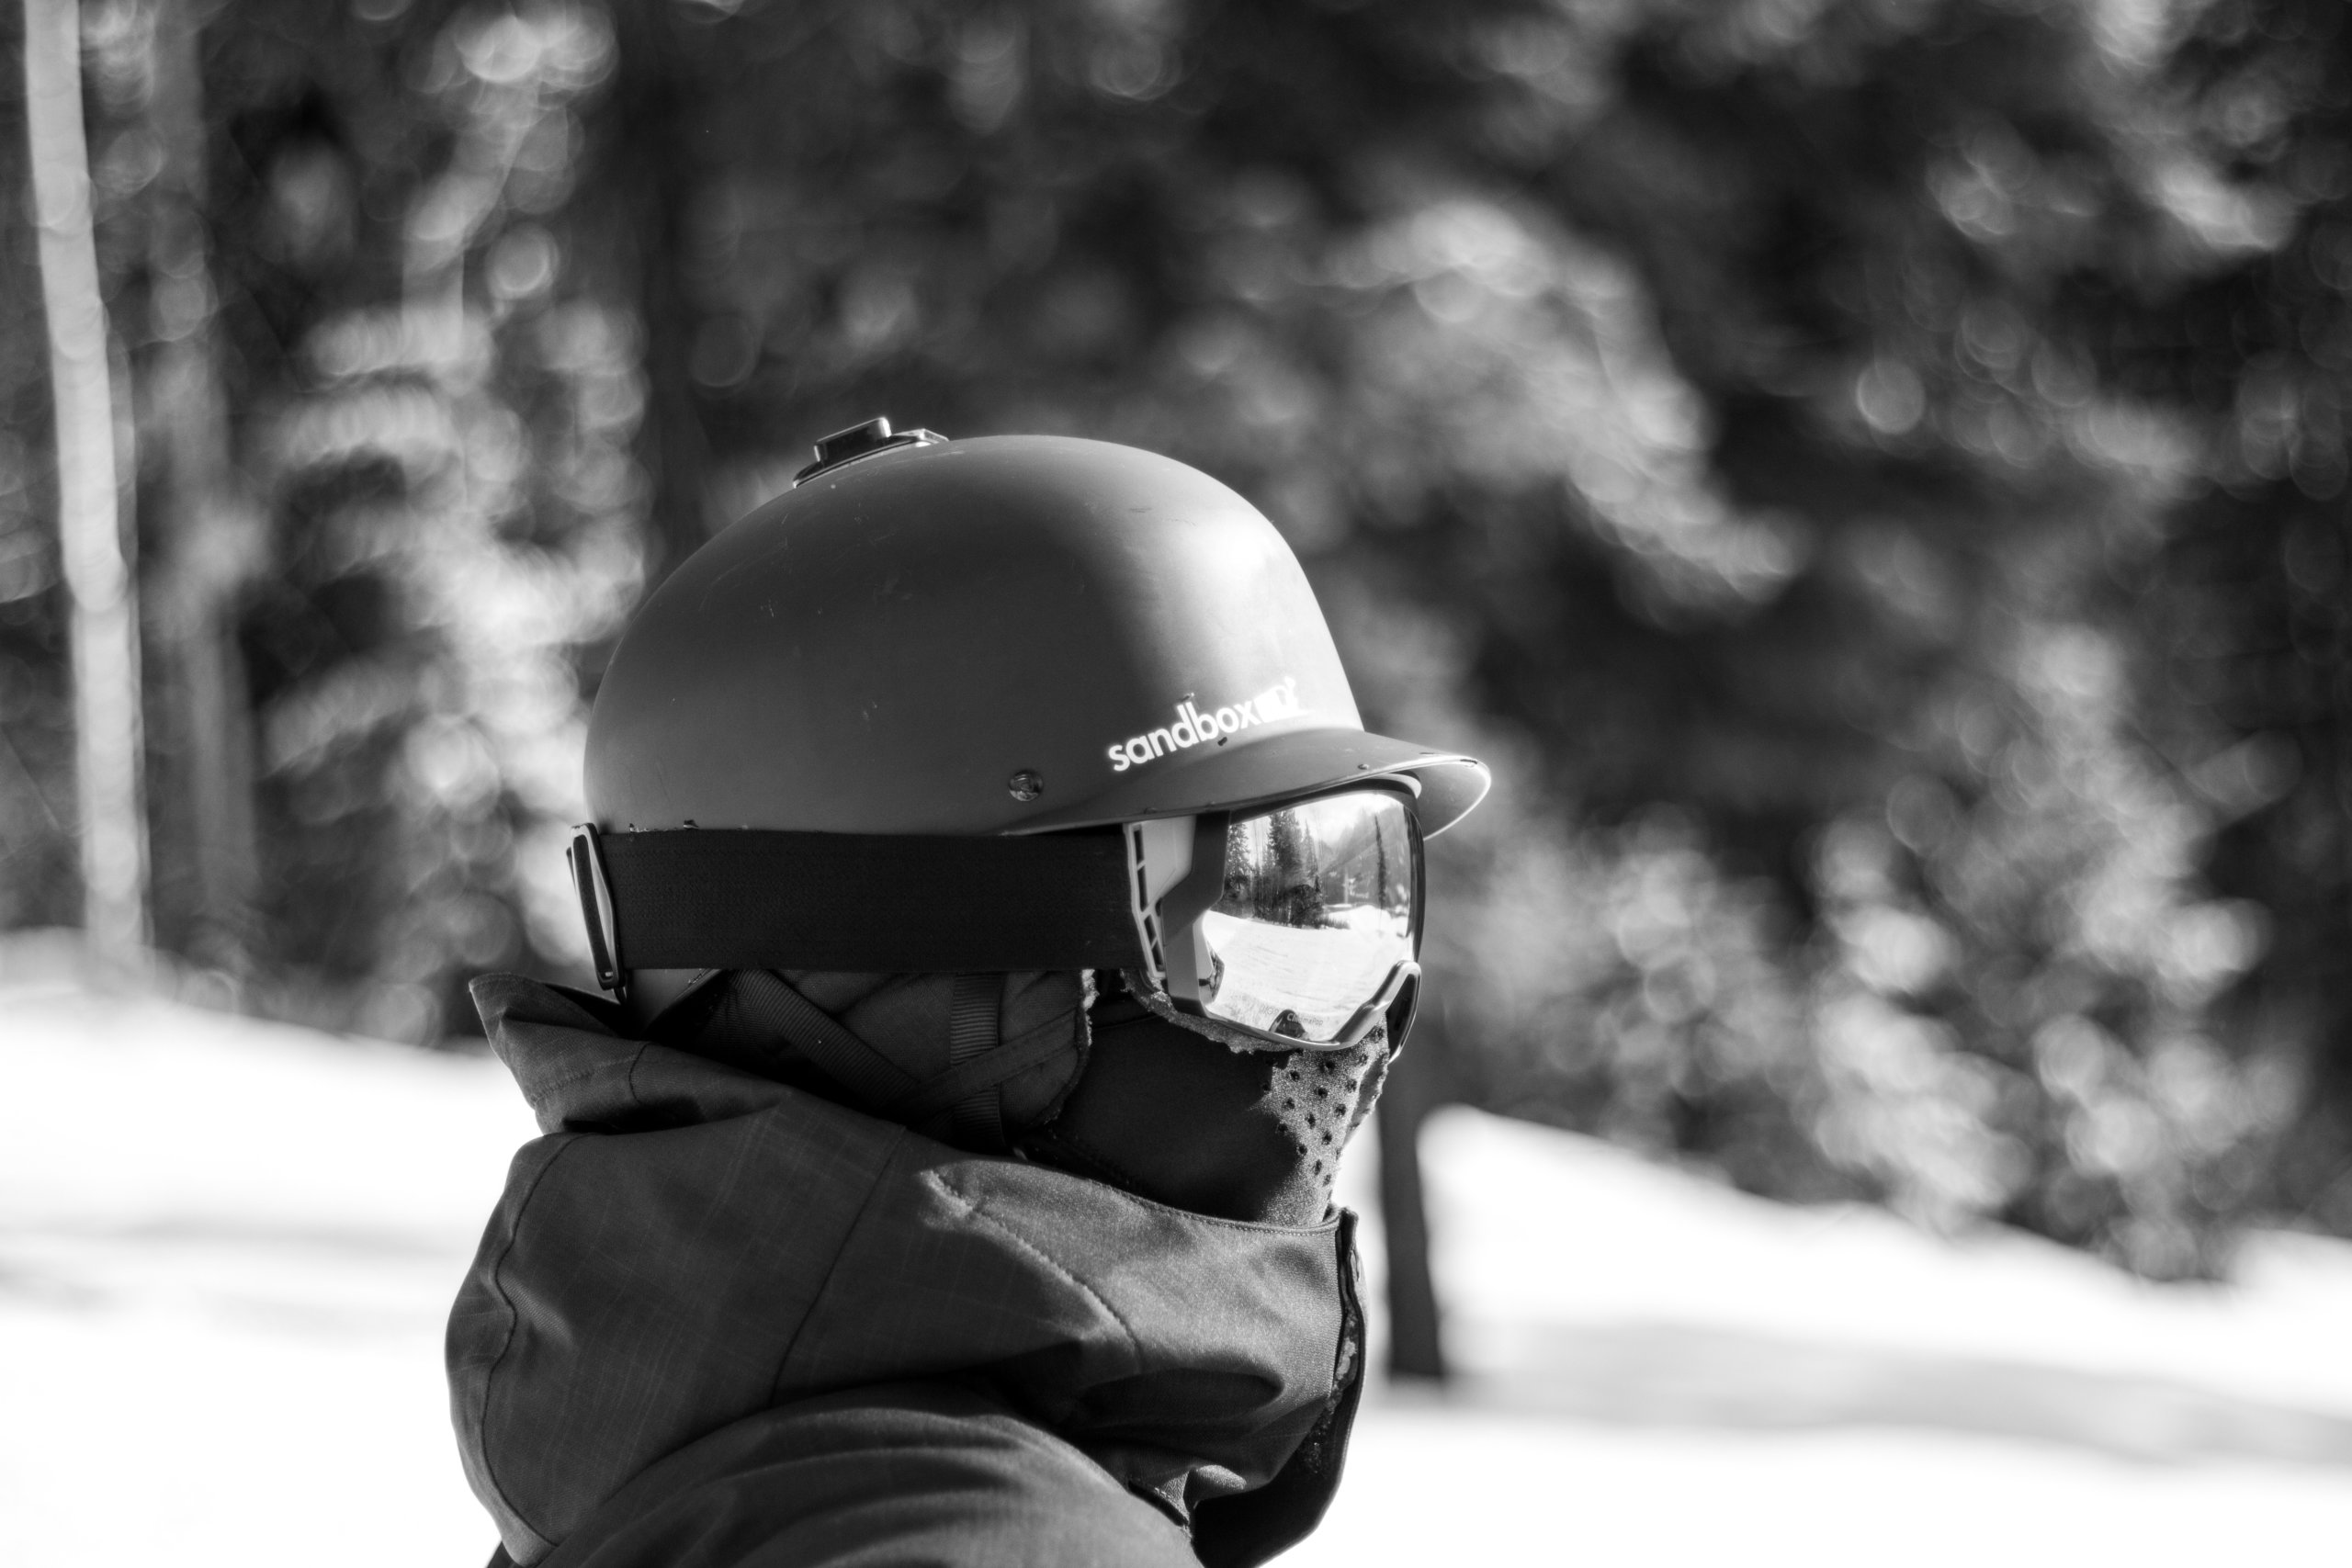 Silverstar ski resort